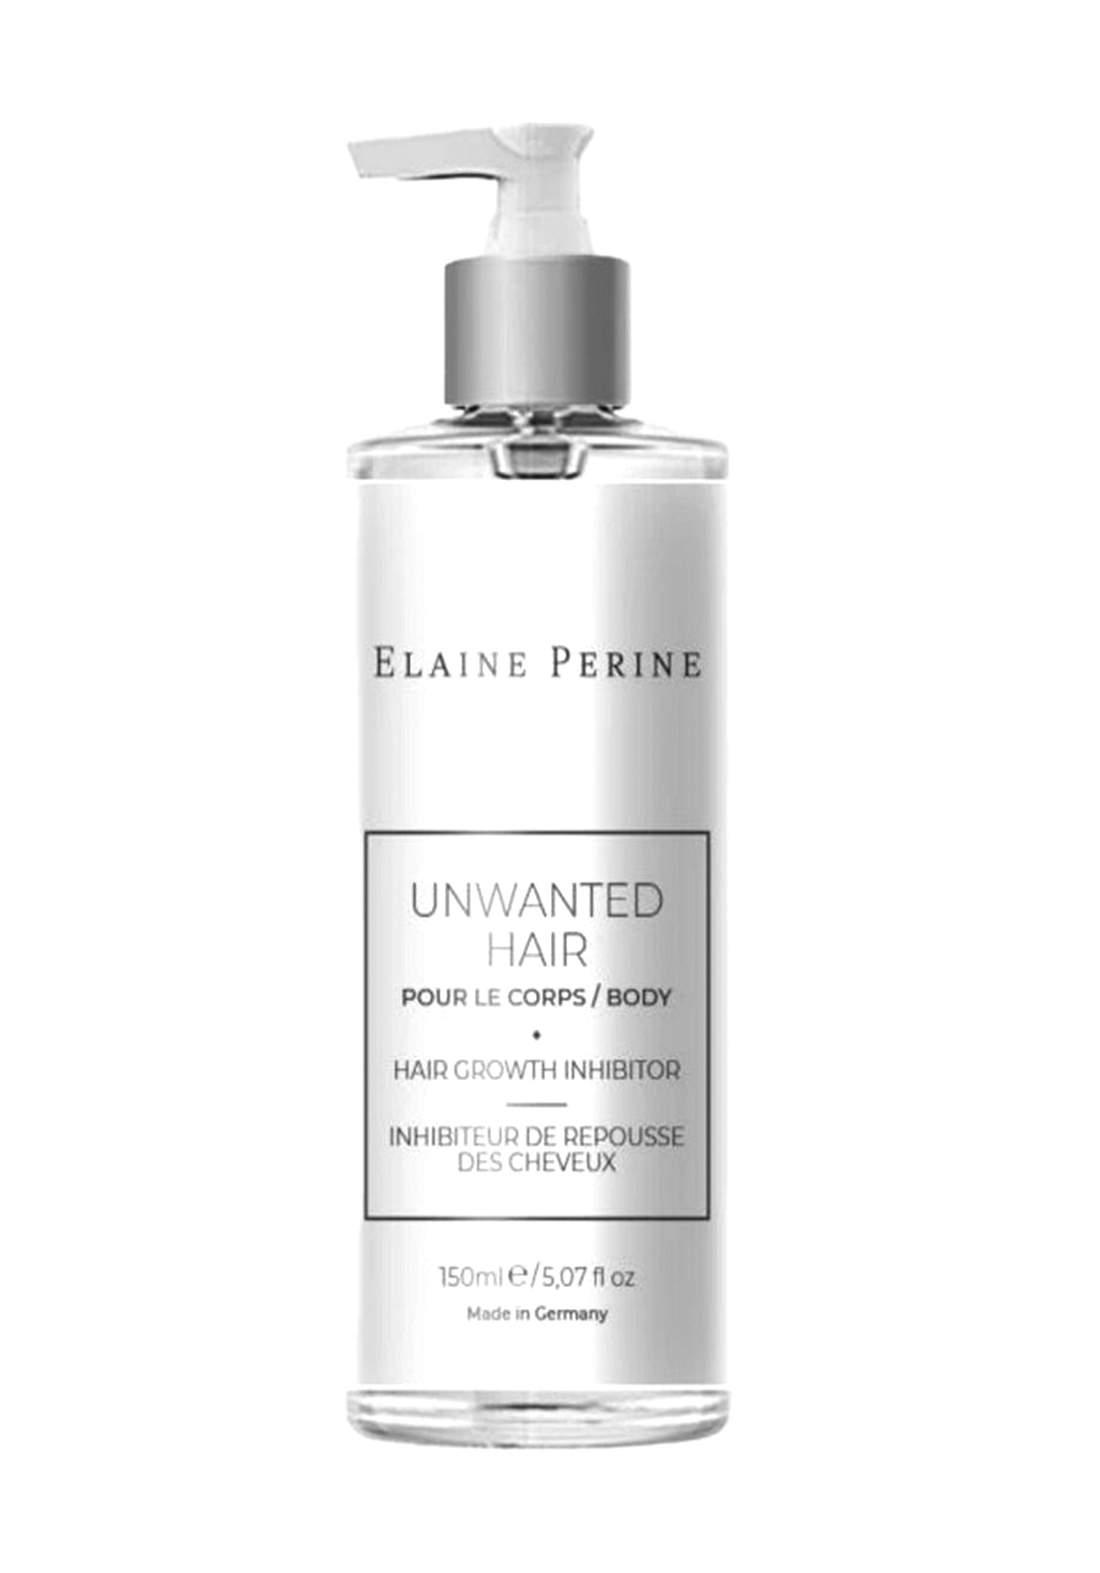 Elaine Perine Unwanted Hair Body 150ml لوشن طبي لتقليل نمو شعر الجسم